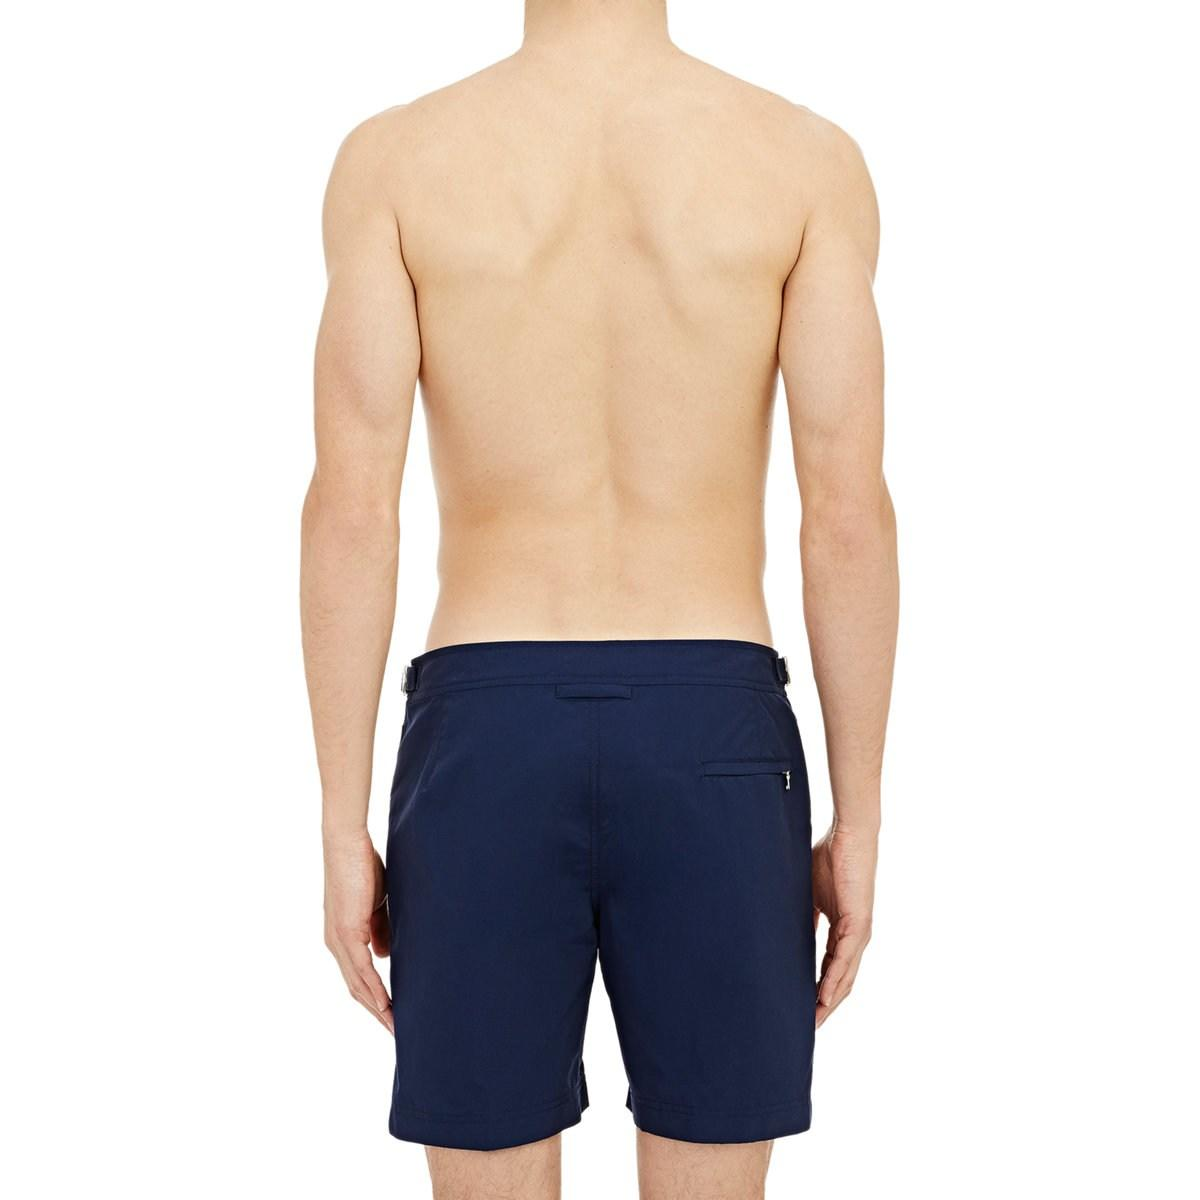 b80c8ac0dc Lyst - Orlebar Brown Bulldog Swim Trunks in Blue for Men